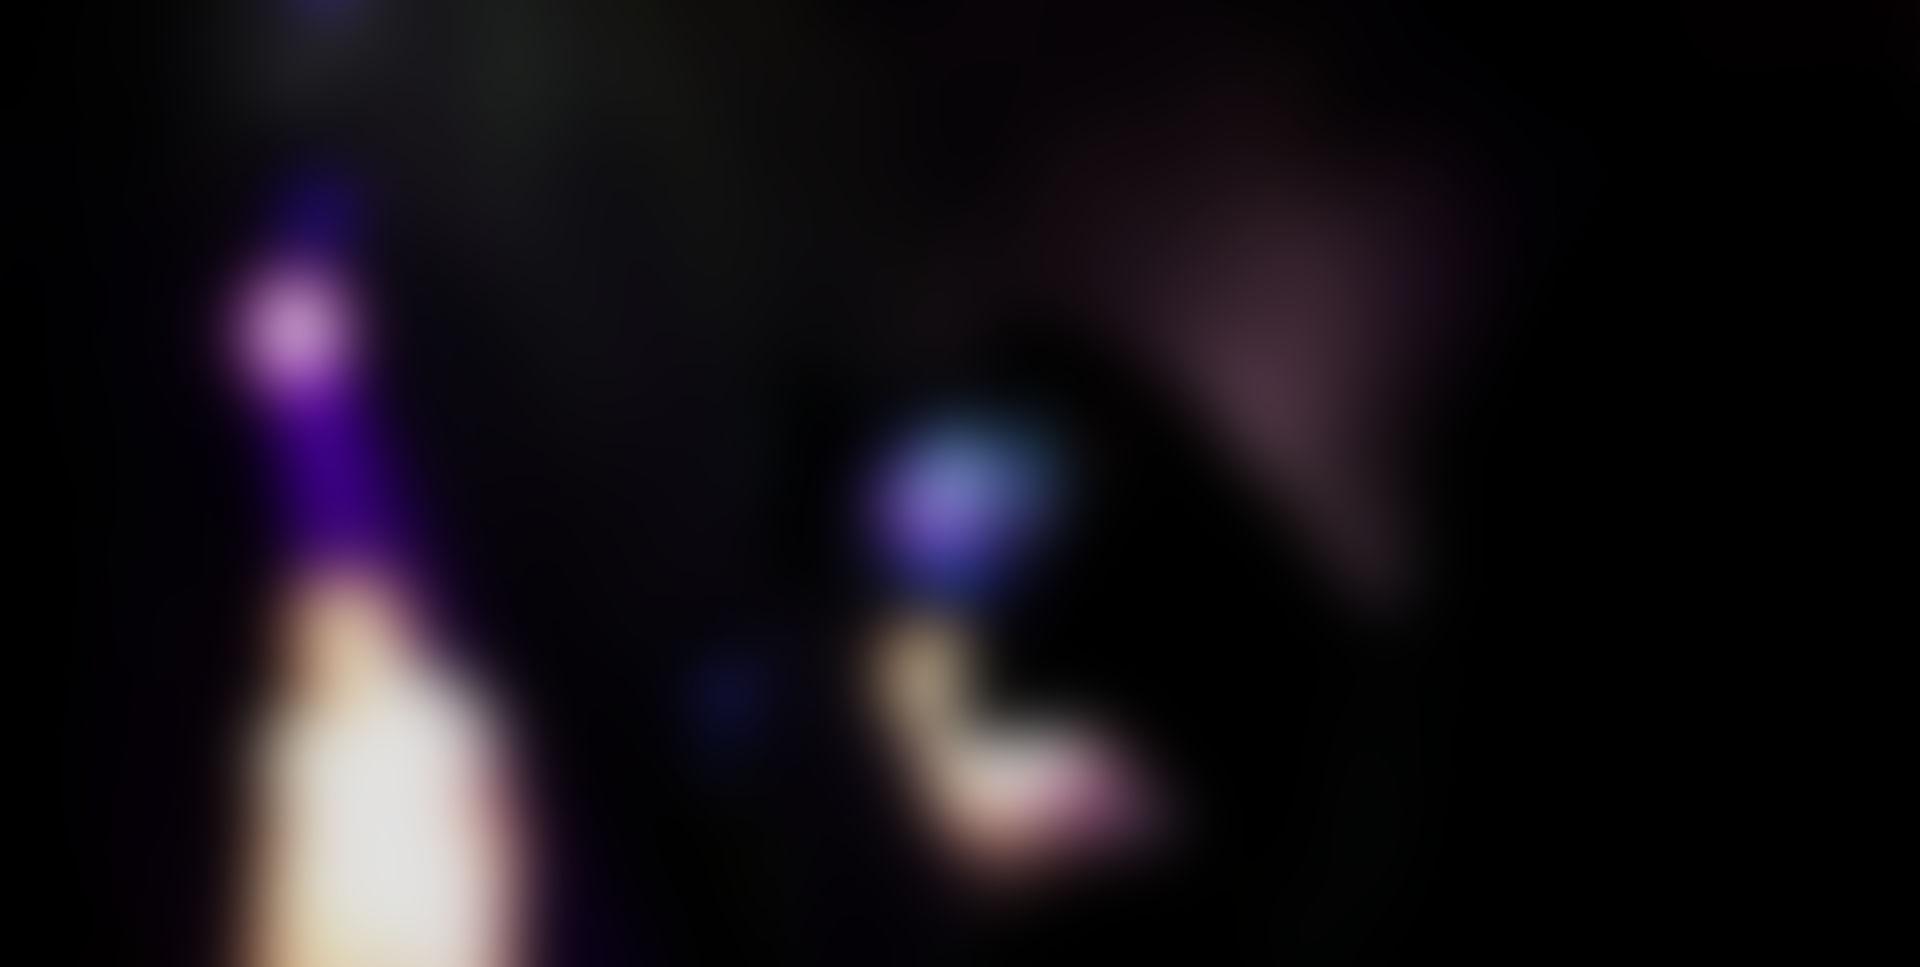 Event image blur